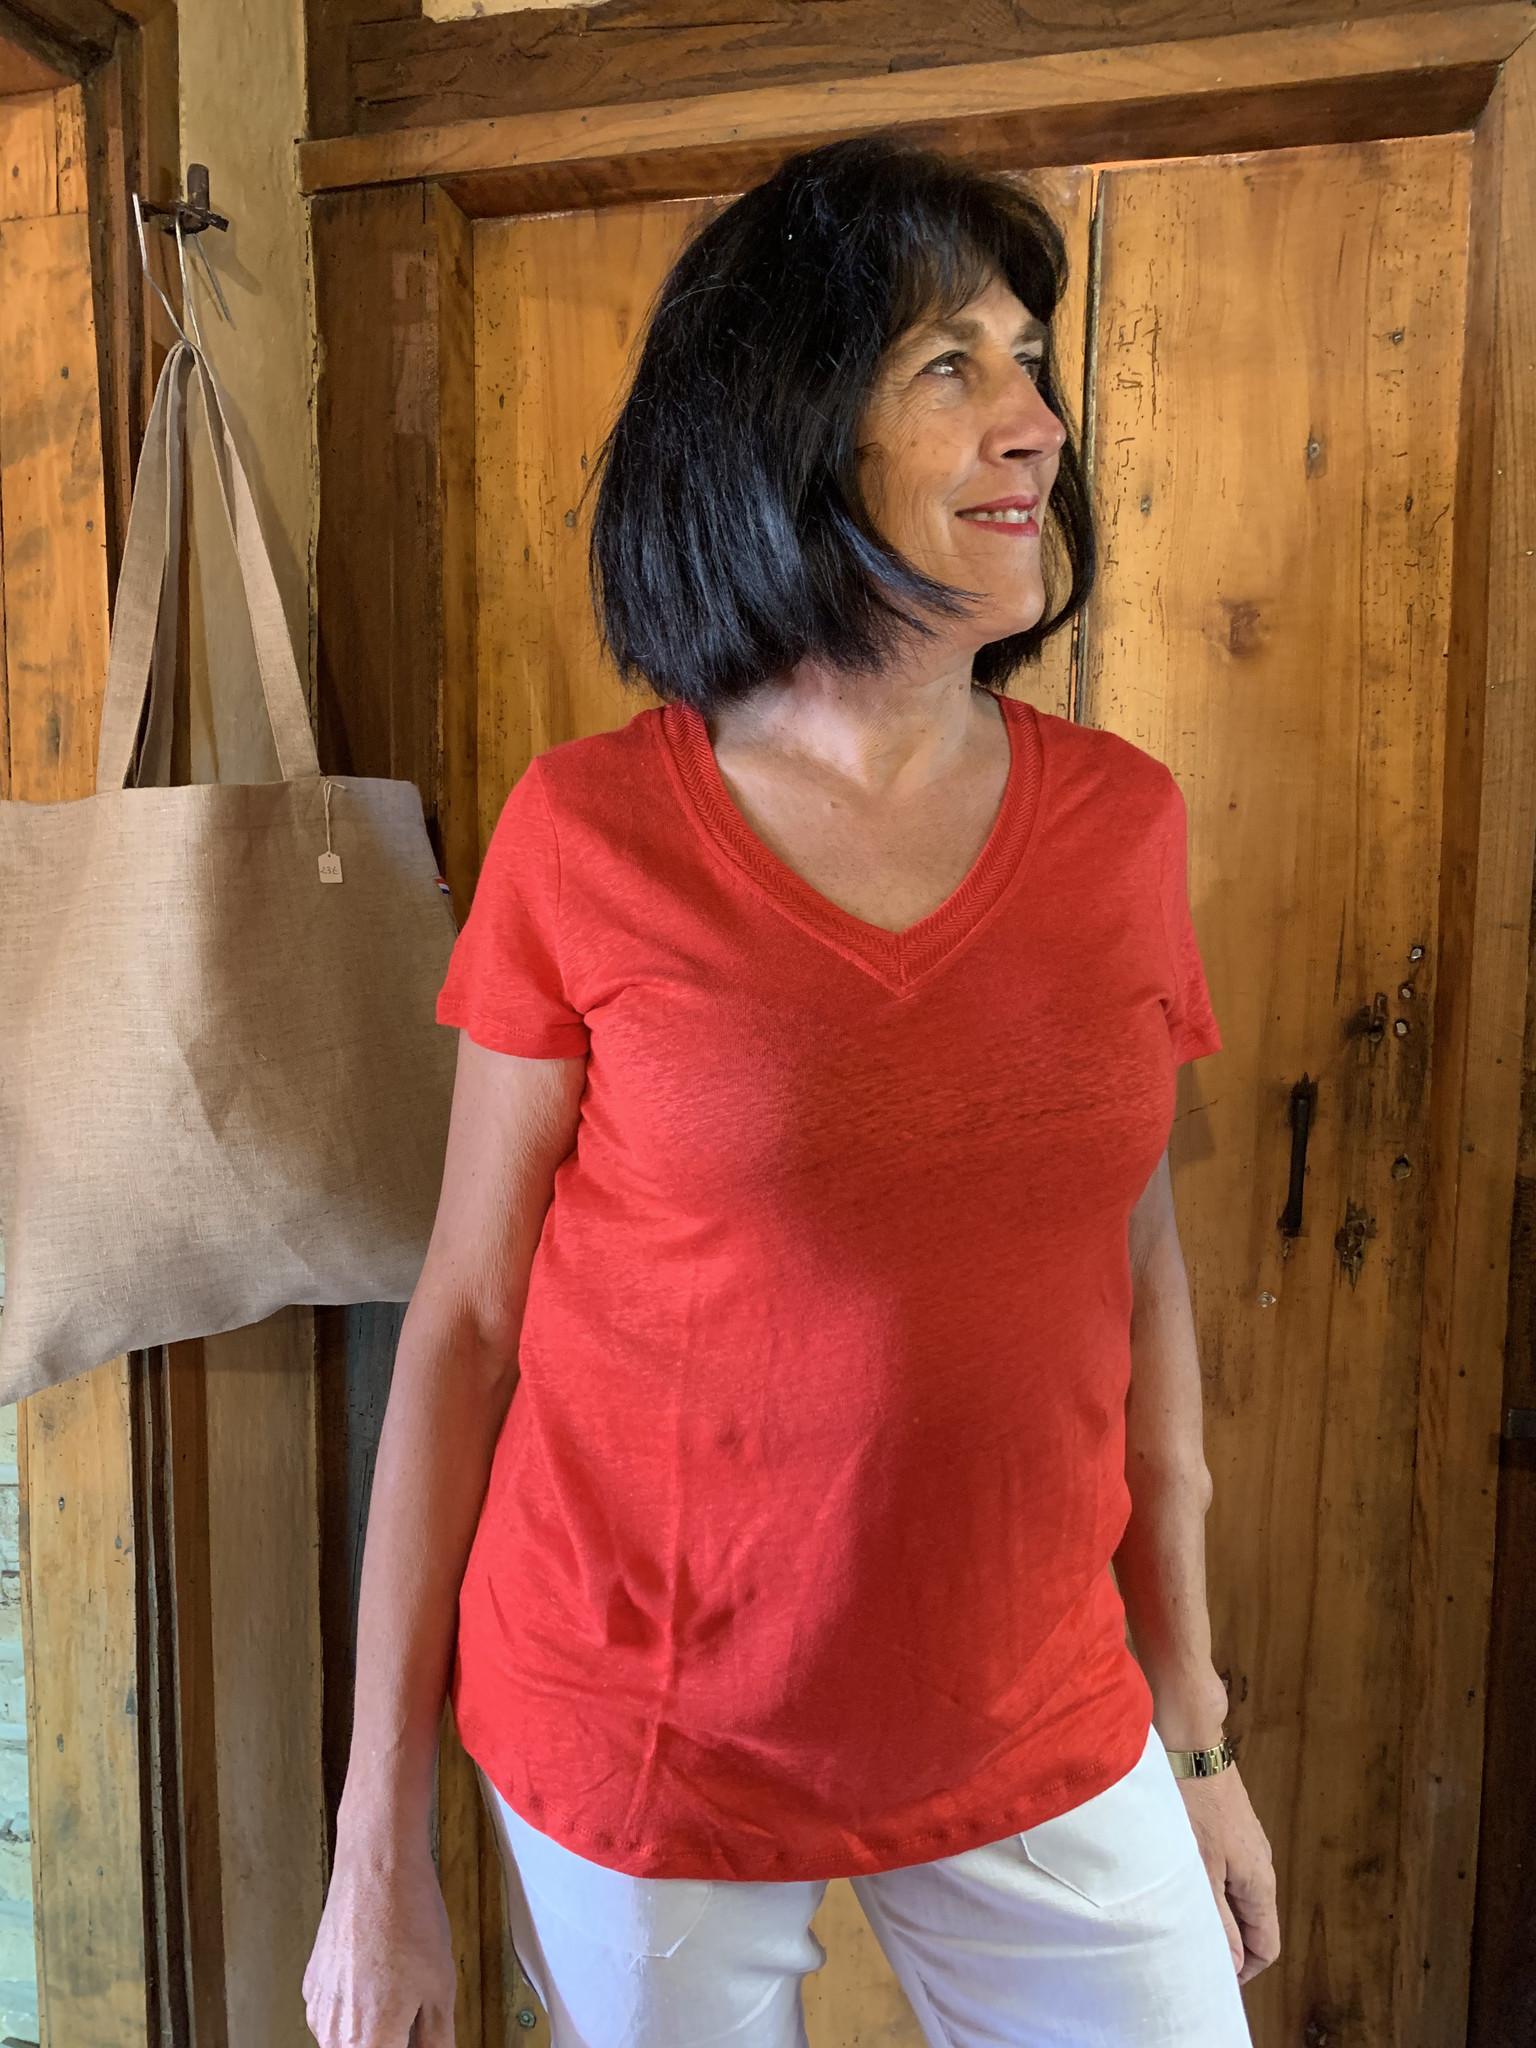 Maloka Red mattea T-shirt